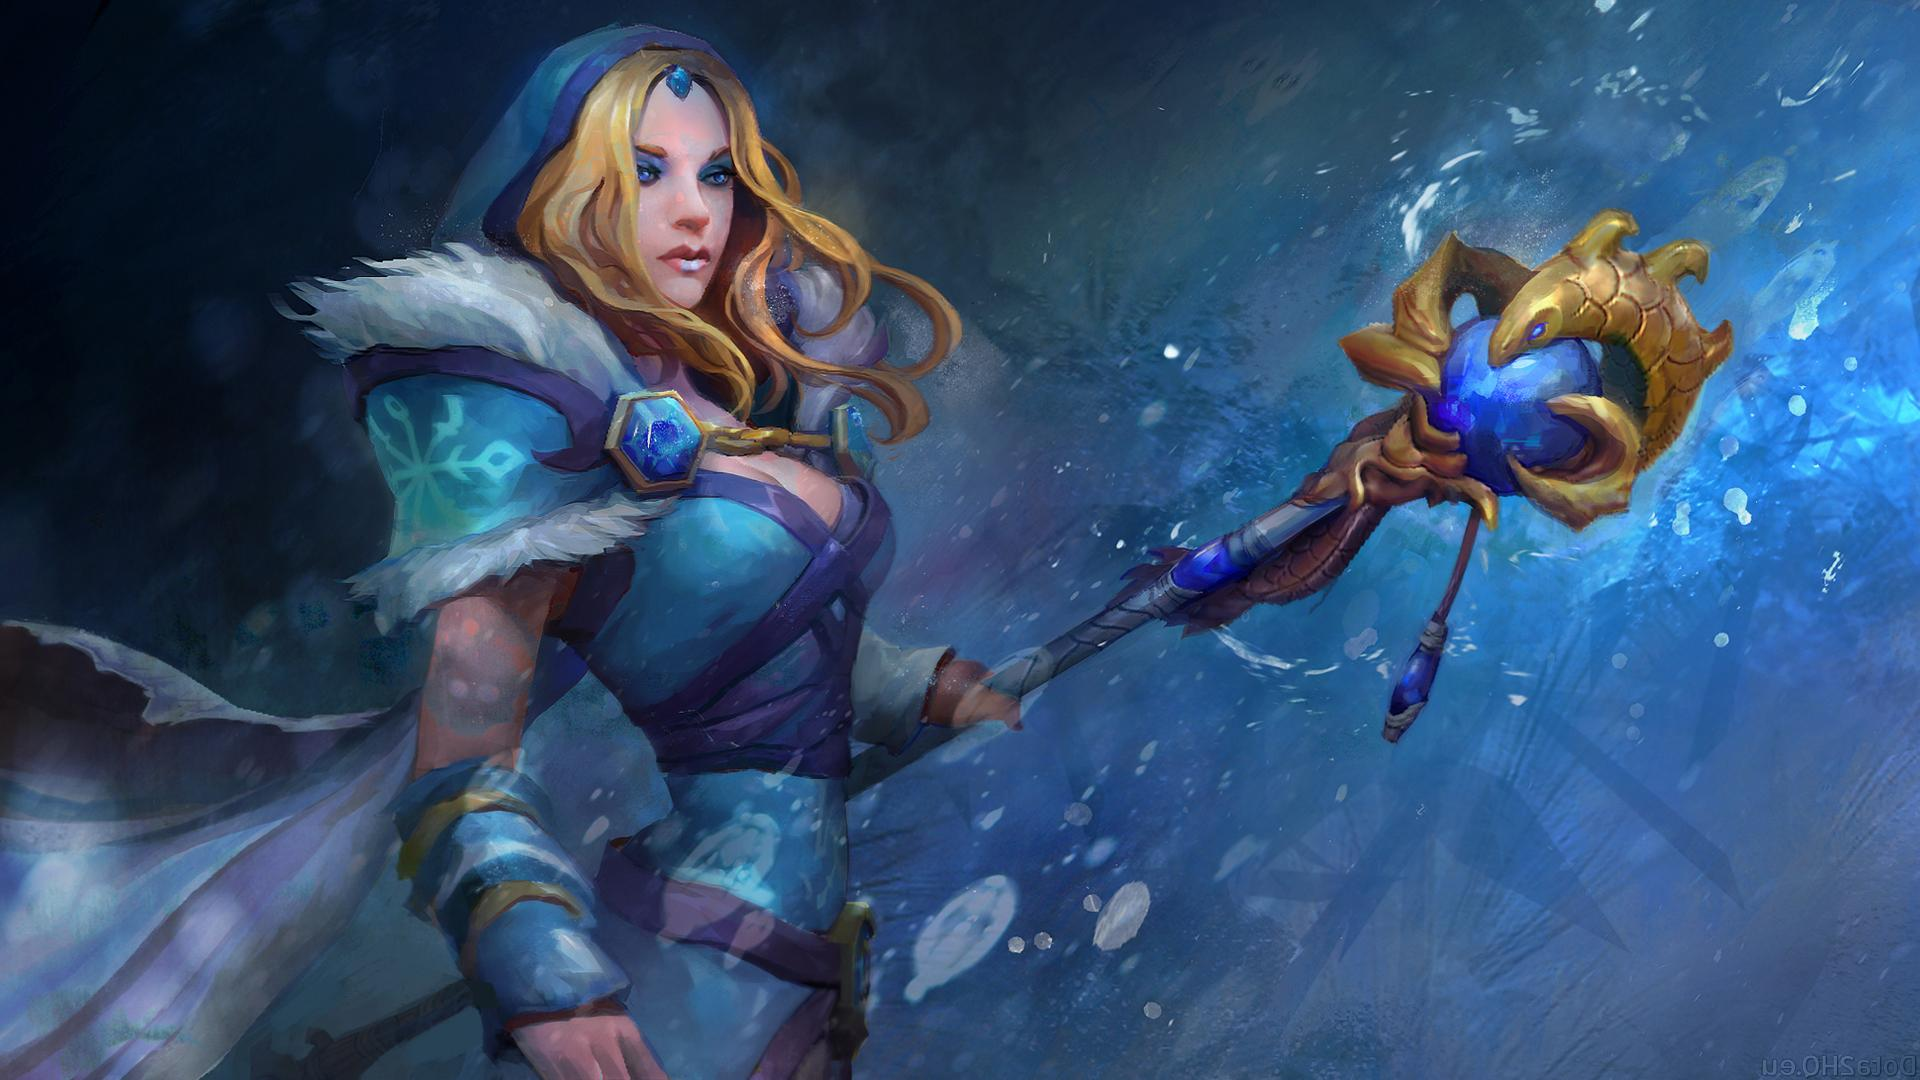 Crystal Maiden Dota 2 Wallpaper